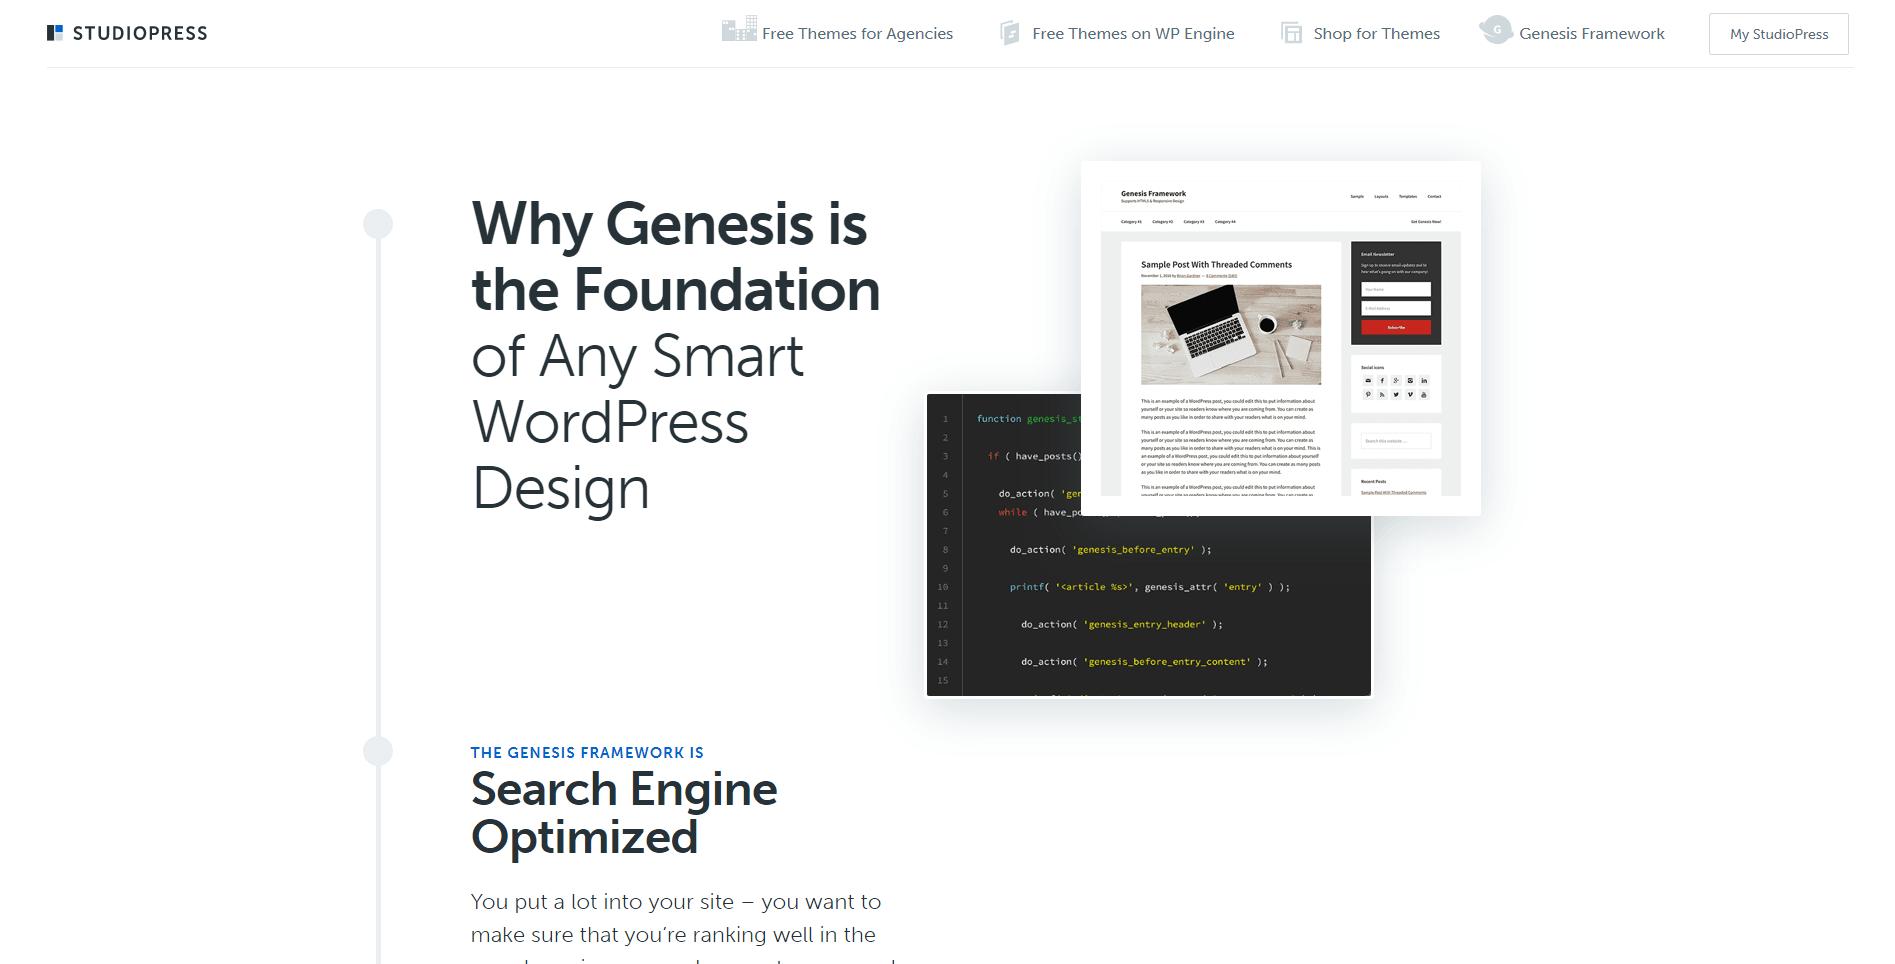 Genesis site image